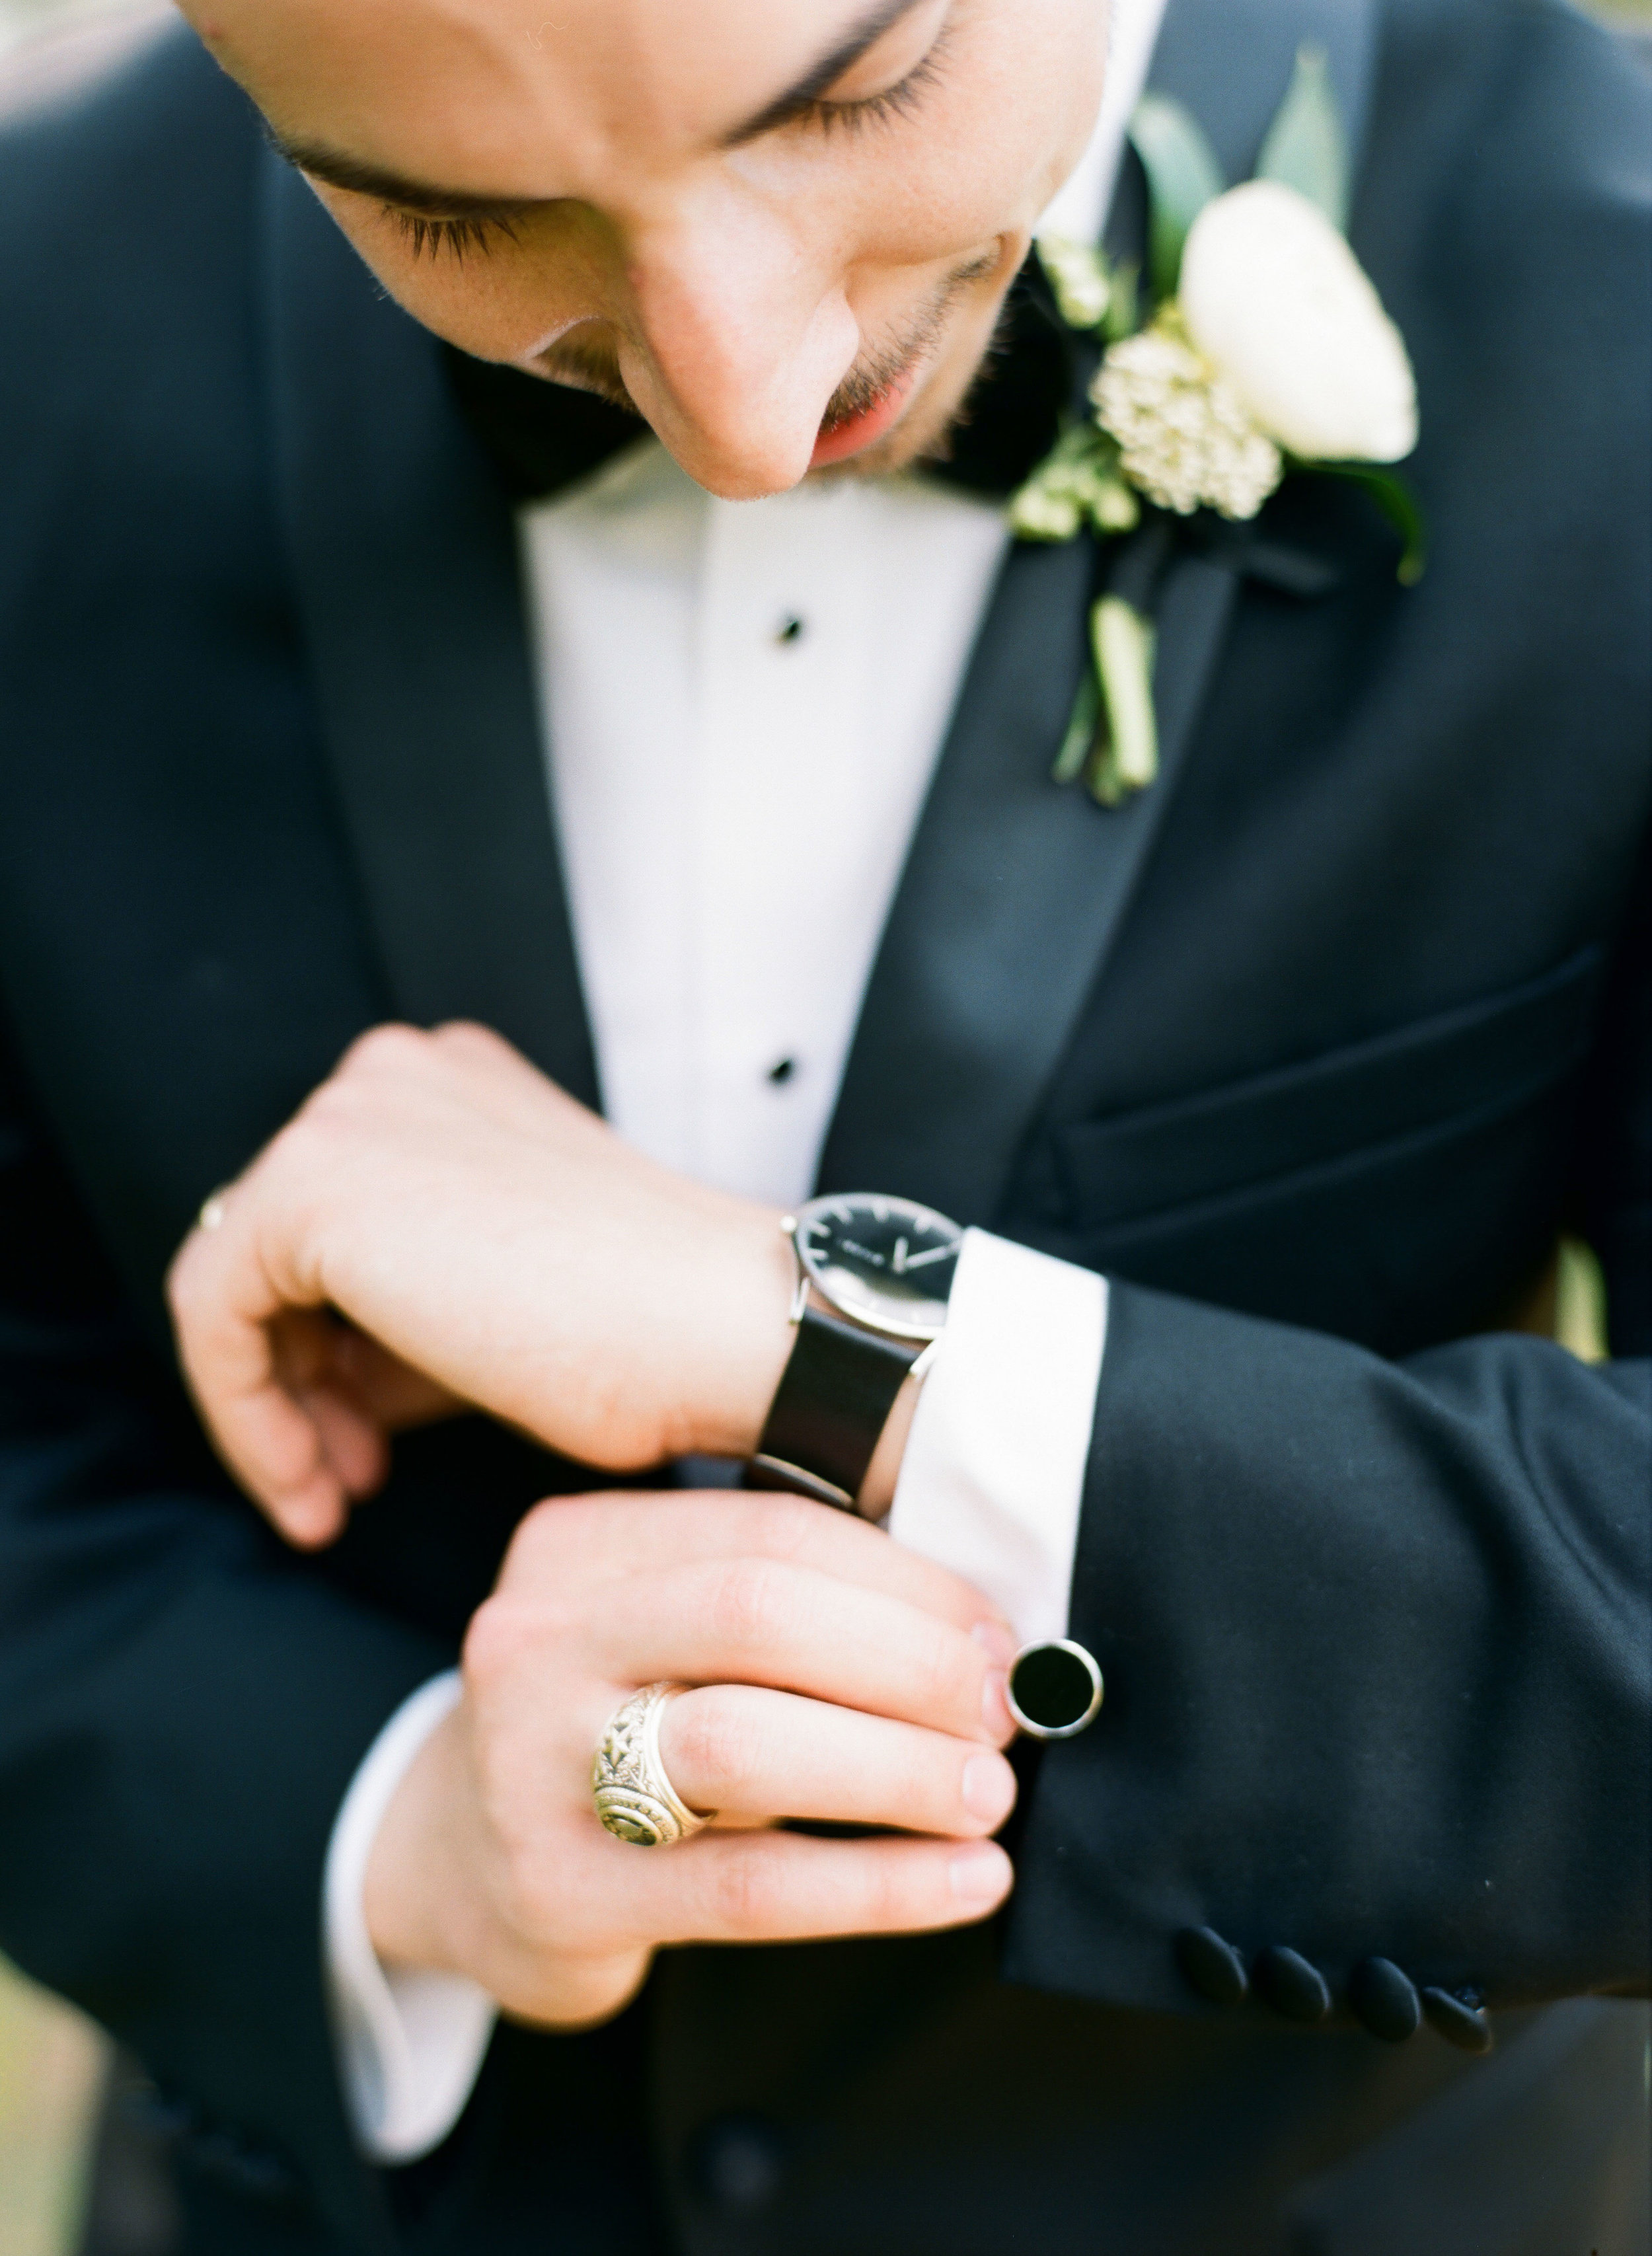 Houston-Wedding-Photography-St.-Anne-Catholic-Church-Houston-Wedding-The-Bell-Tower-on-34th-reception-wedding-film-8.jpg